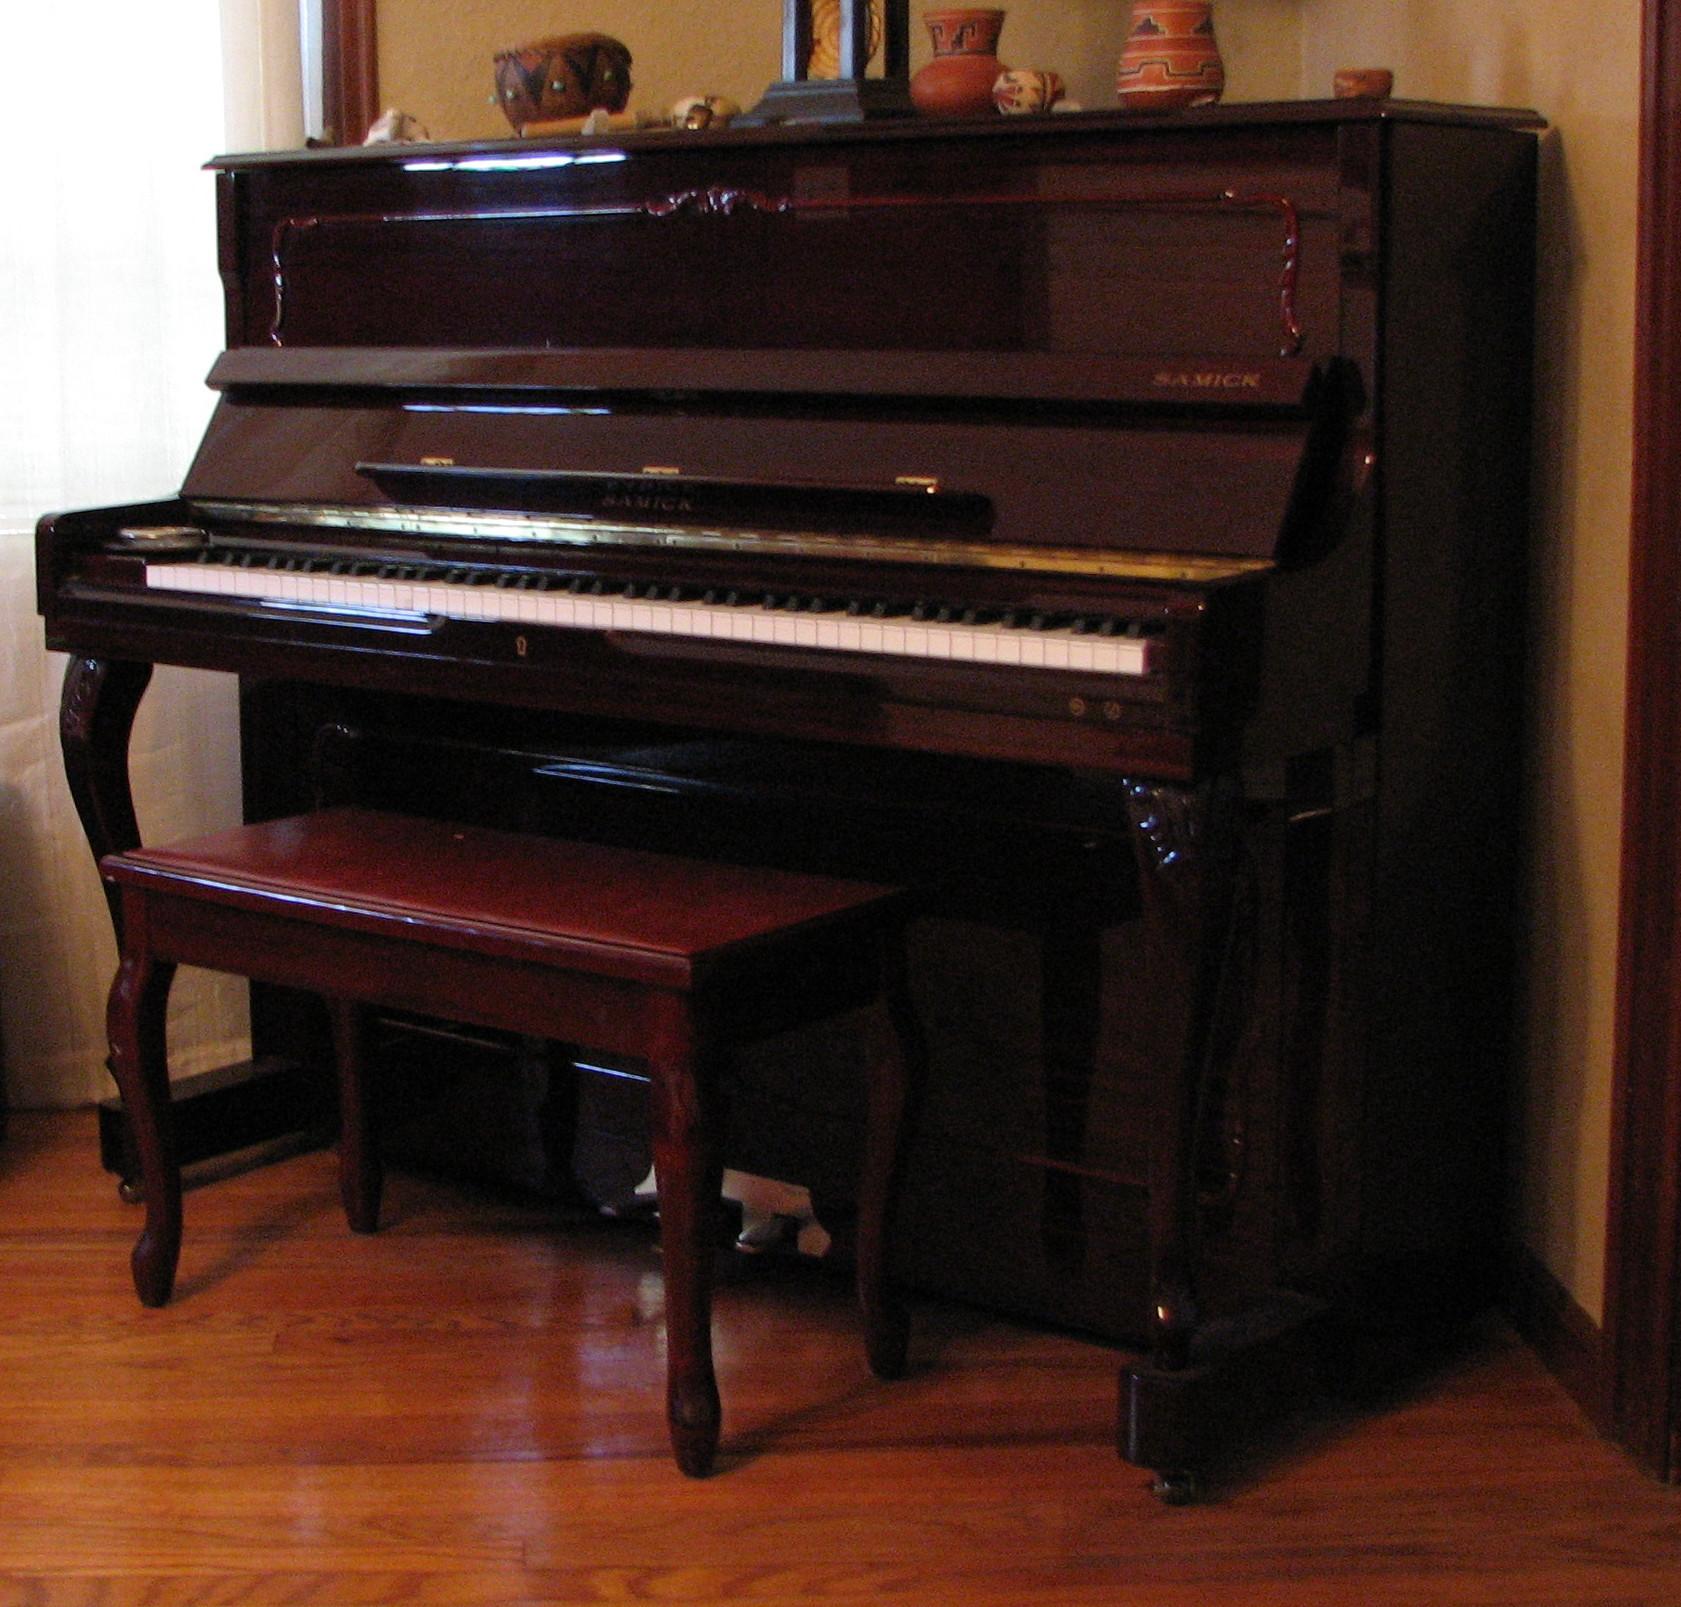 Piano piano photo 3607893 fanpop for Garage aggiunta piani 2 piani